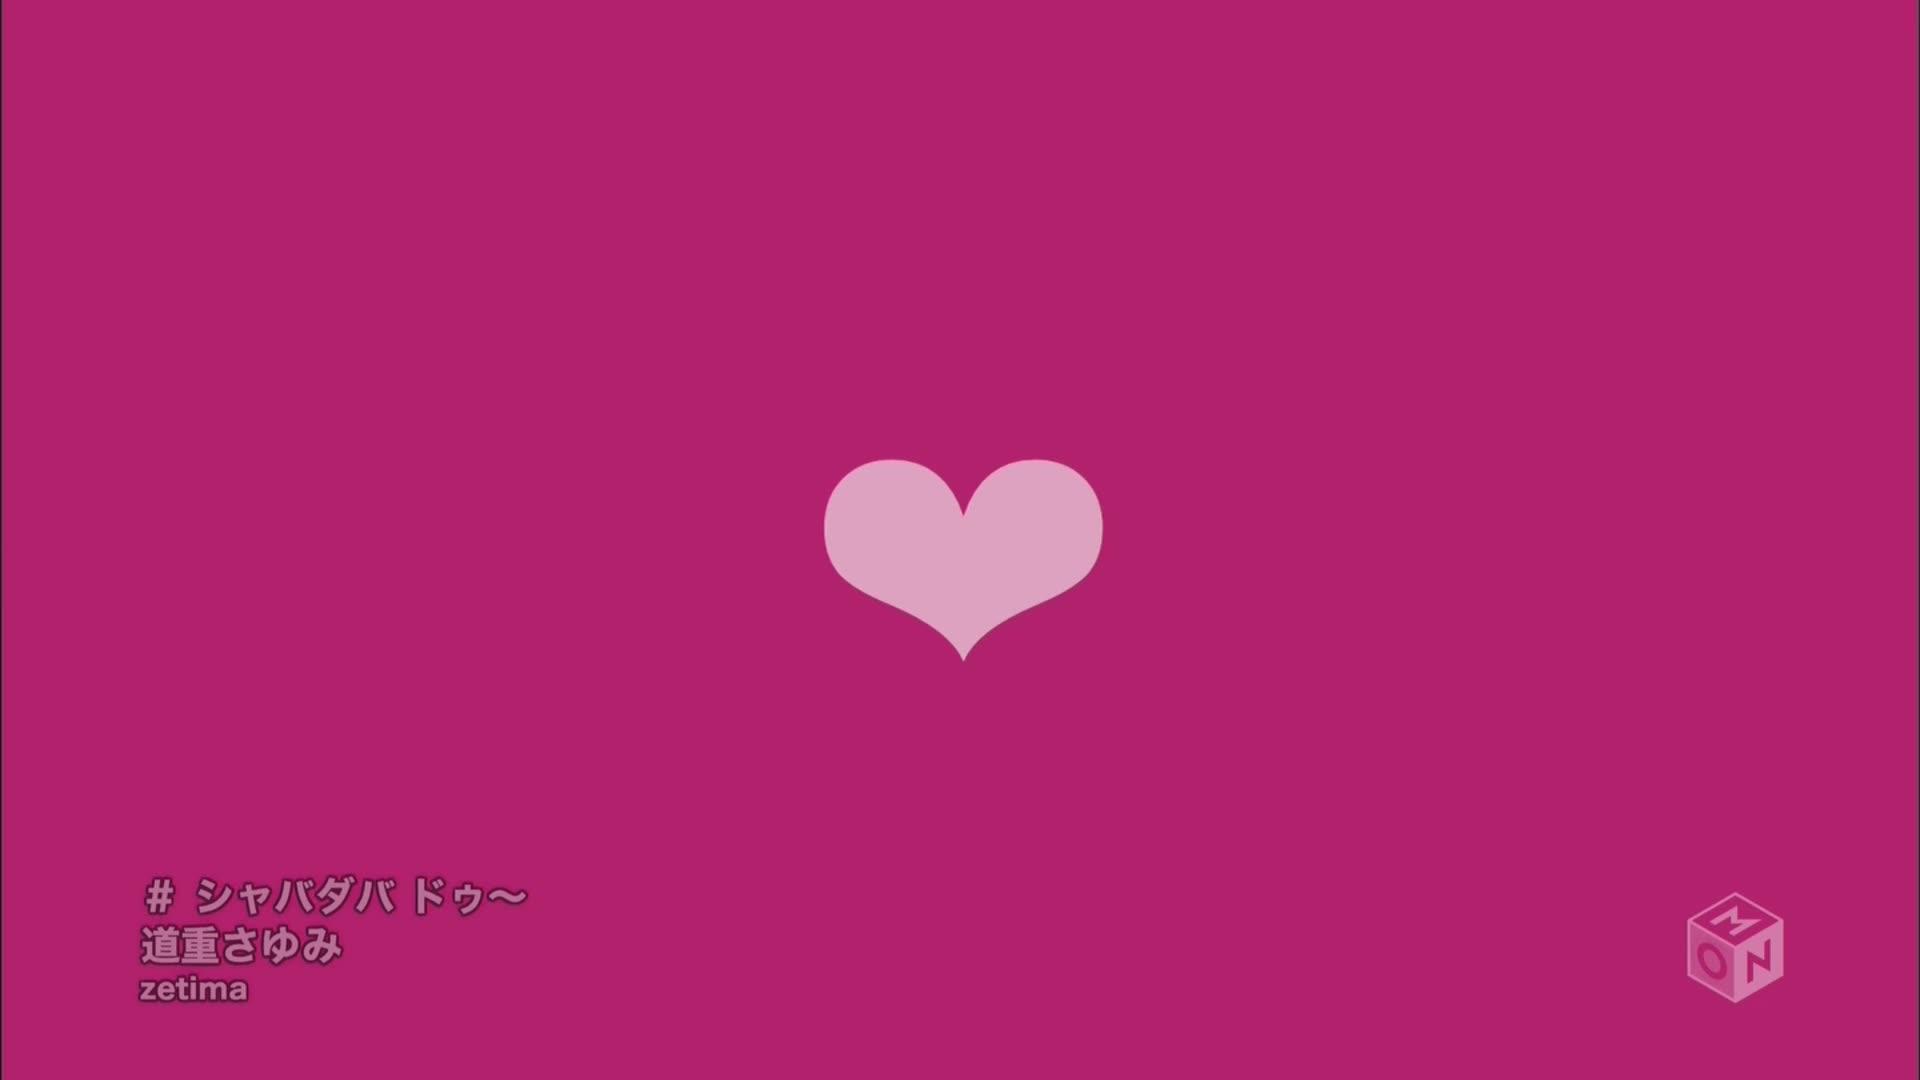 Https Morningtime WordPress Com 2013 10 02 Fanfic Idol Cabin In The Woods 2016 01 16t04 34 05 00 00 Monthly Https Morningtime WordPress Com 2013 09 29 The Morningtime Awards 2013 2016 01 14t03 25 11 00 00 Monthly Https Morningtime